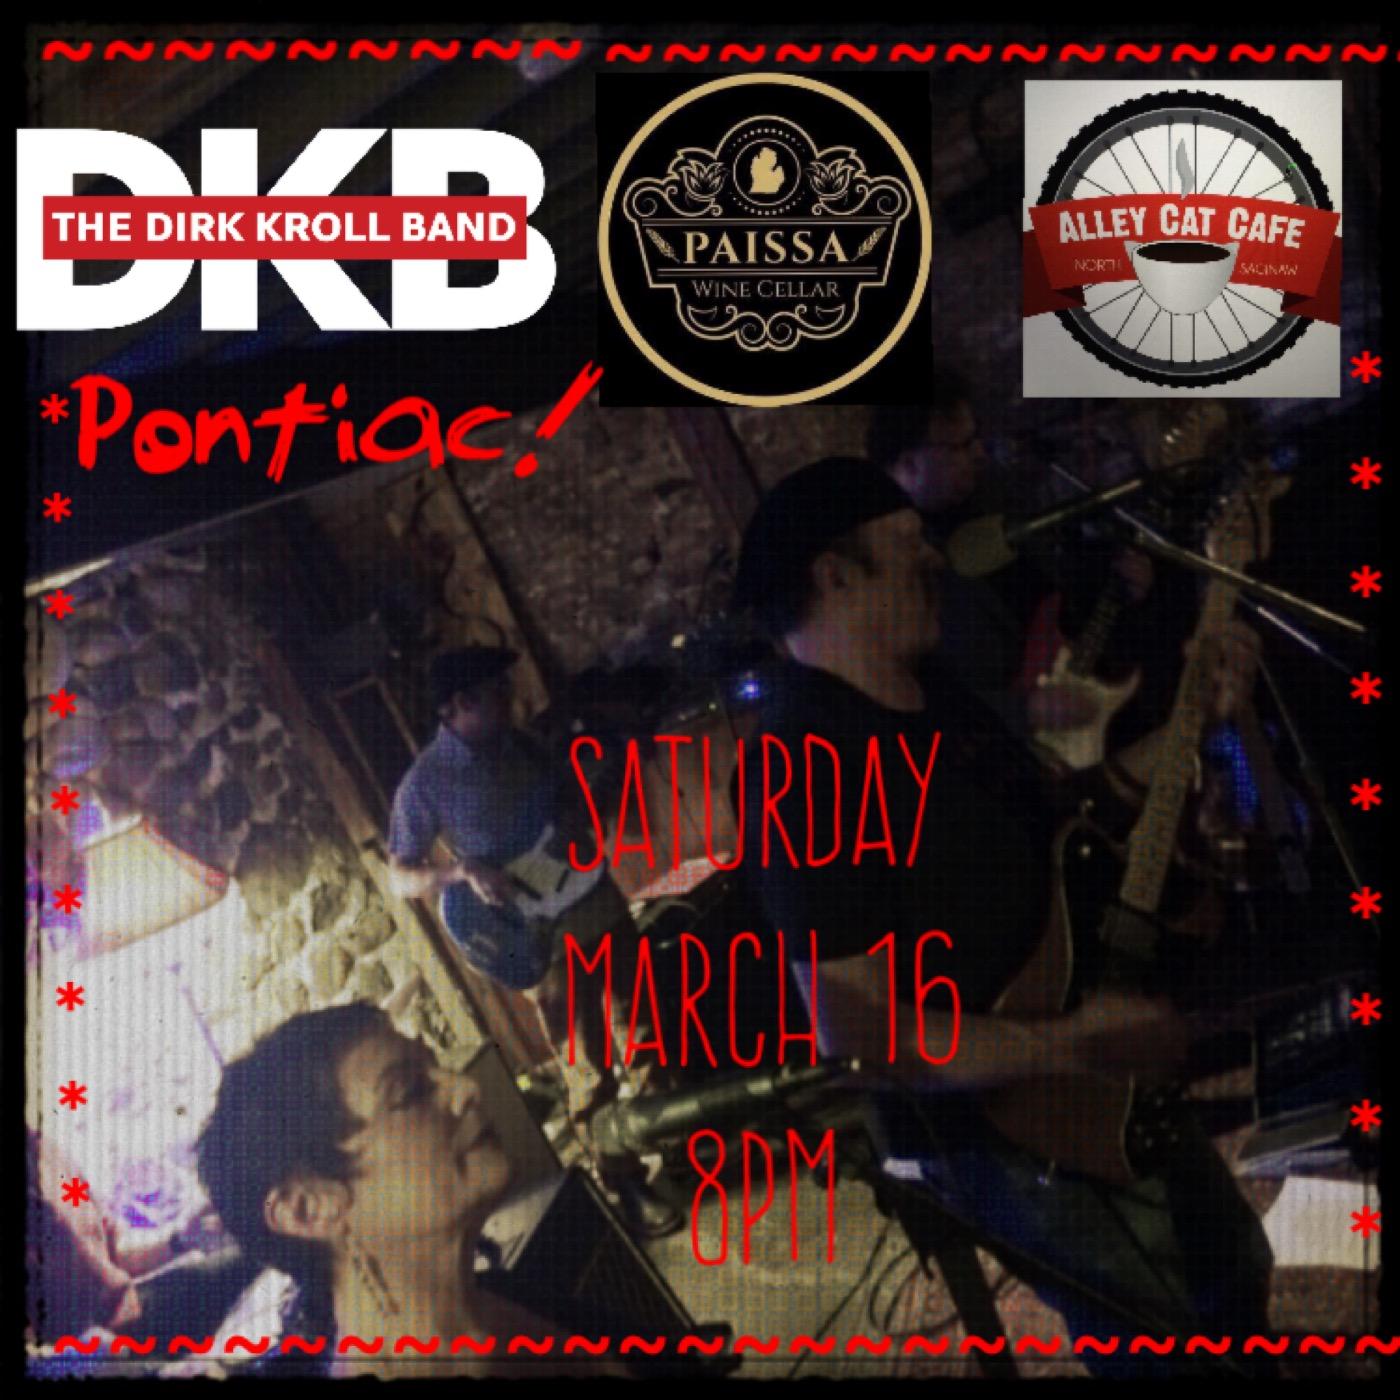 THE DIRK KROLL BAND live! @ Paissa Wine Cellar